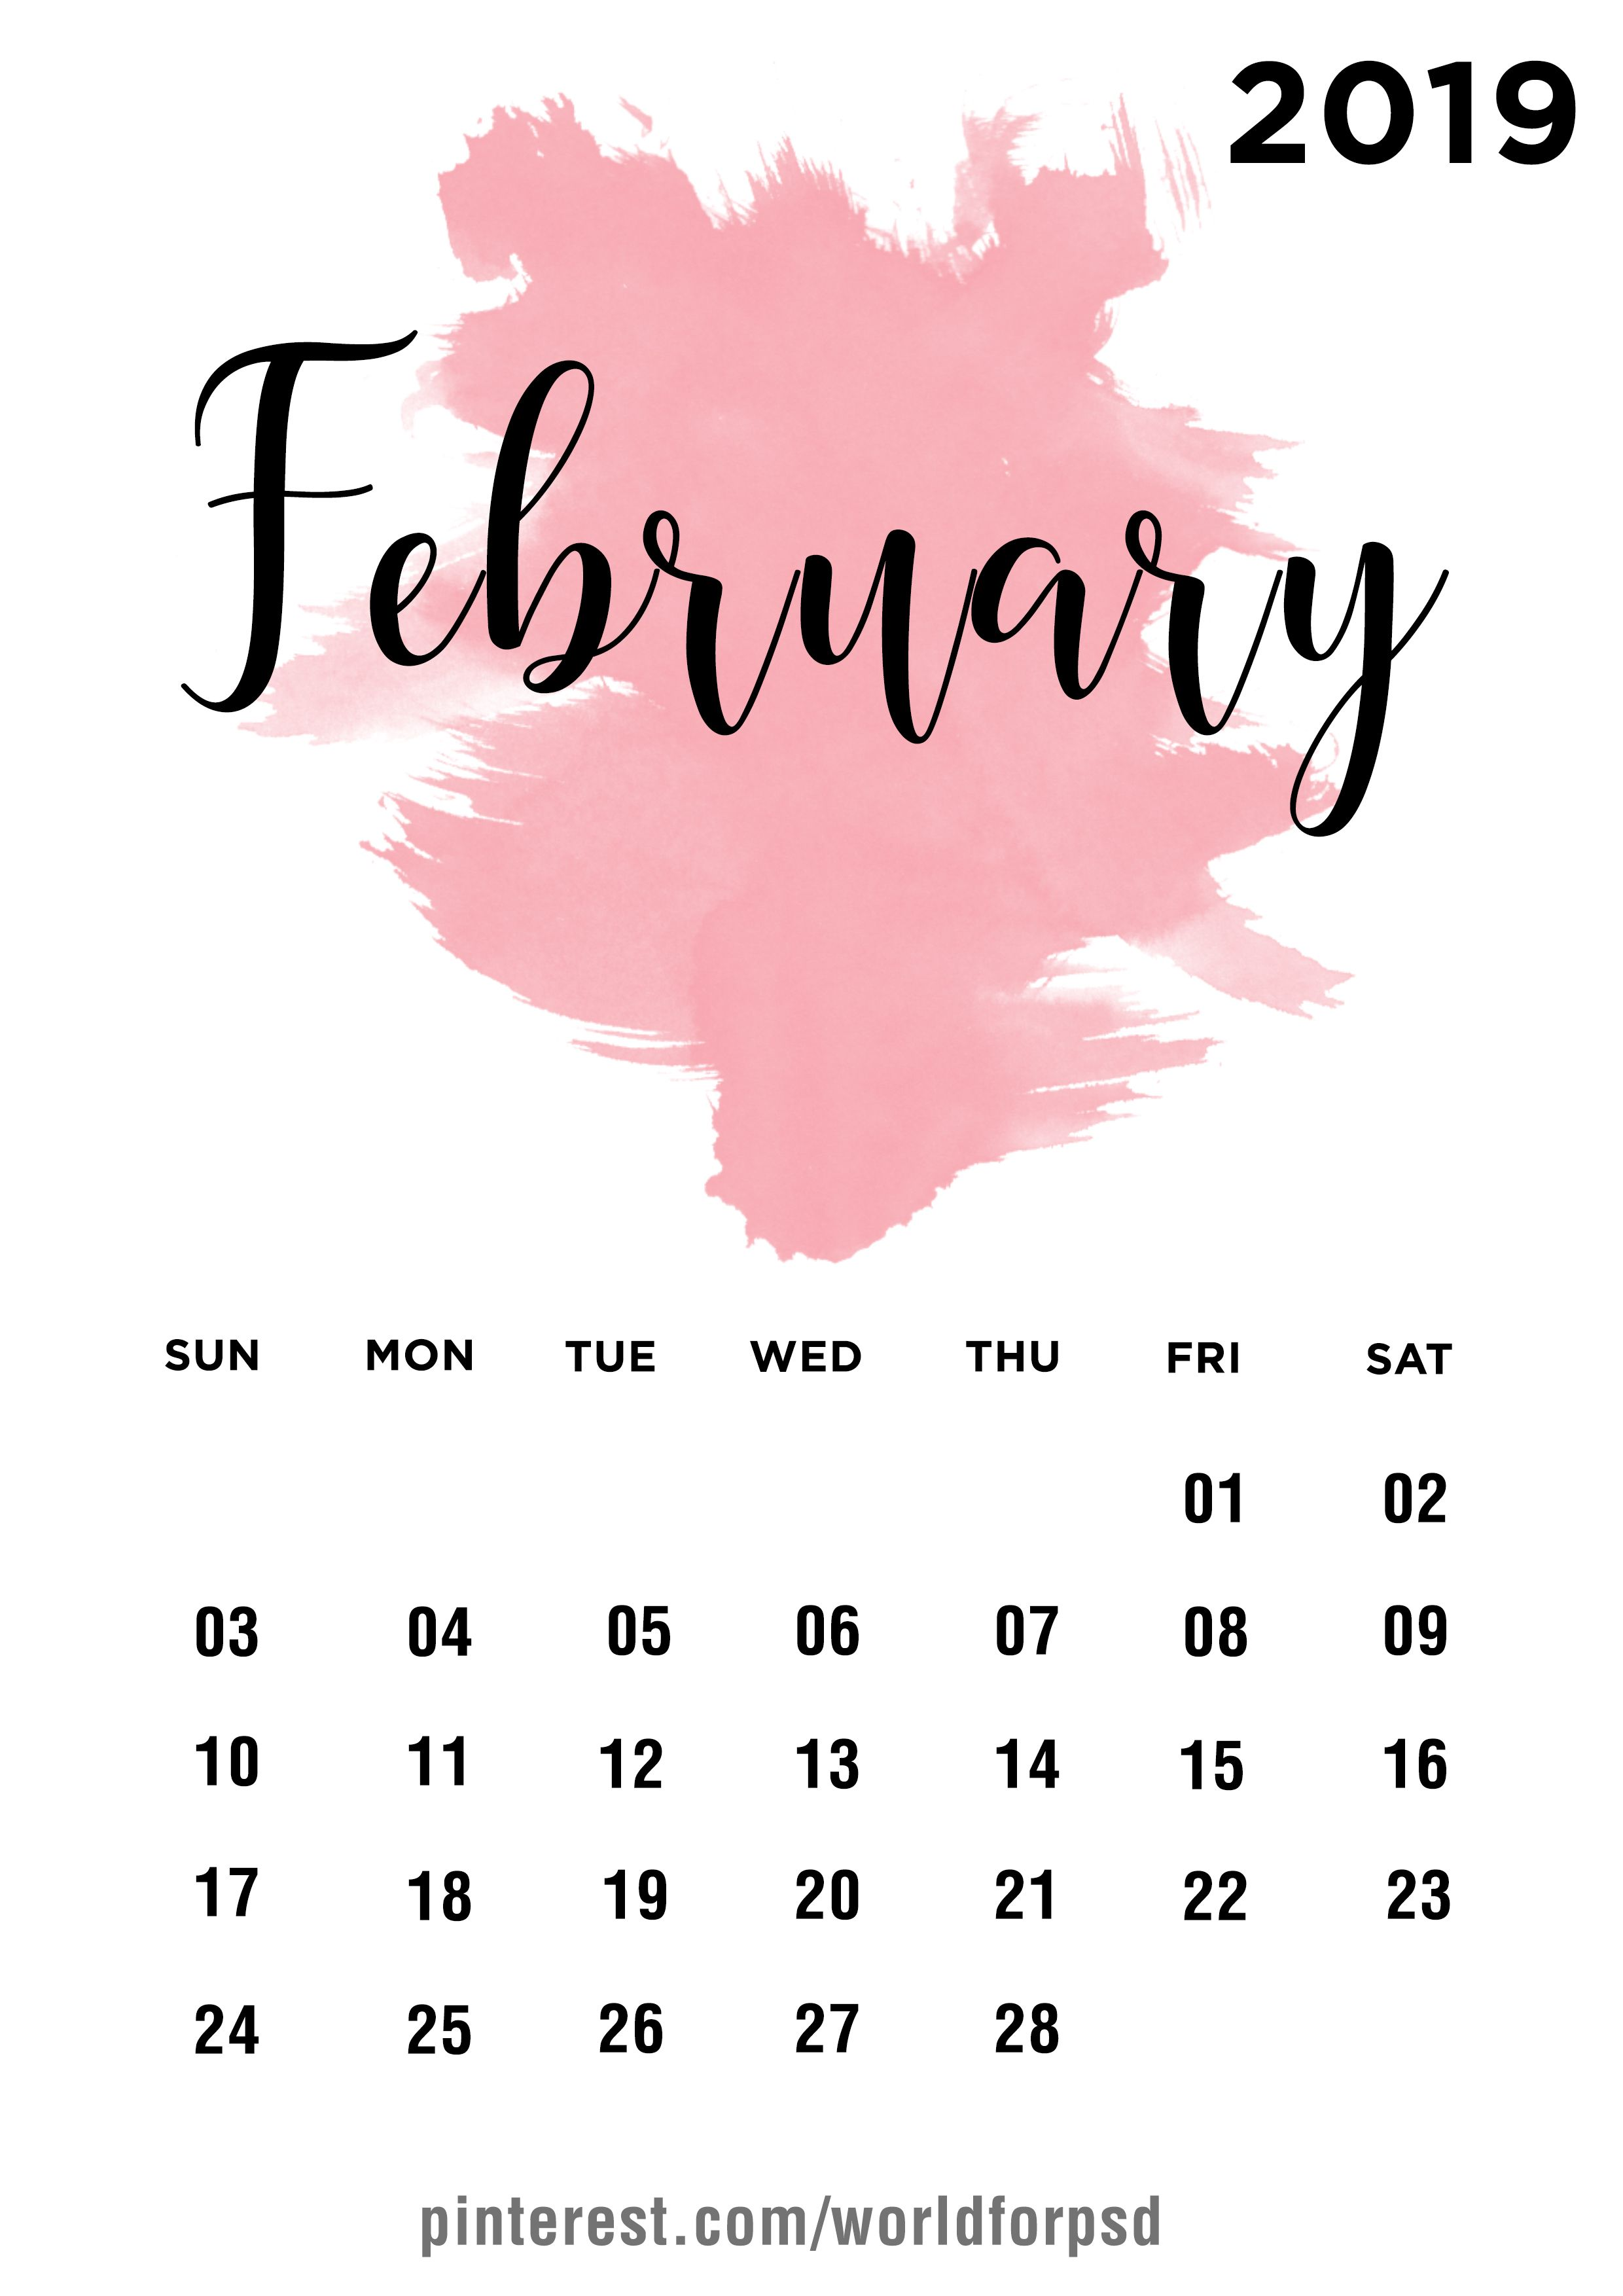 February 2019 Calendar Design Calendar Calendarideas Newyear